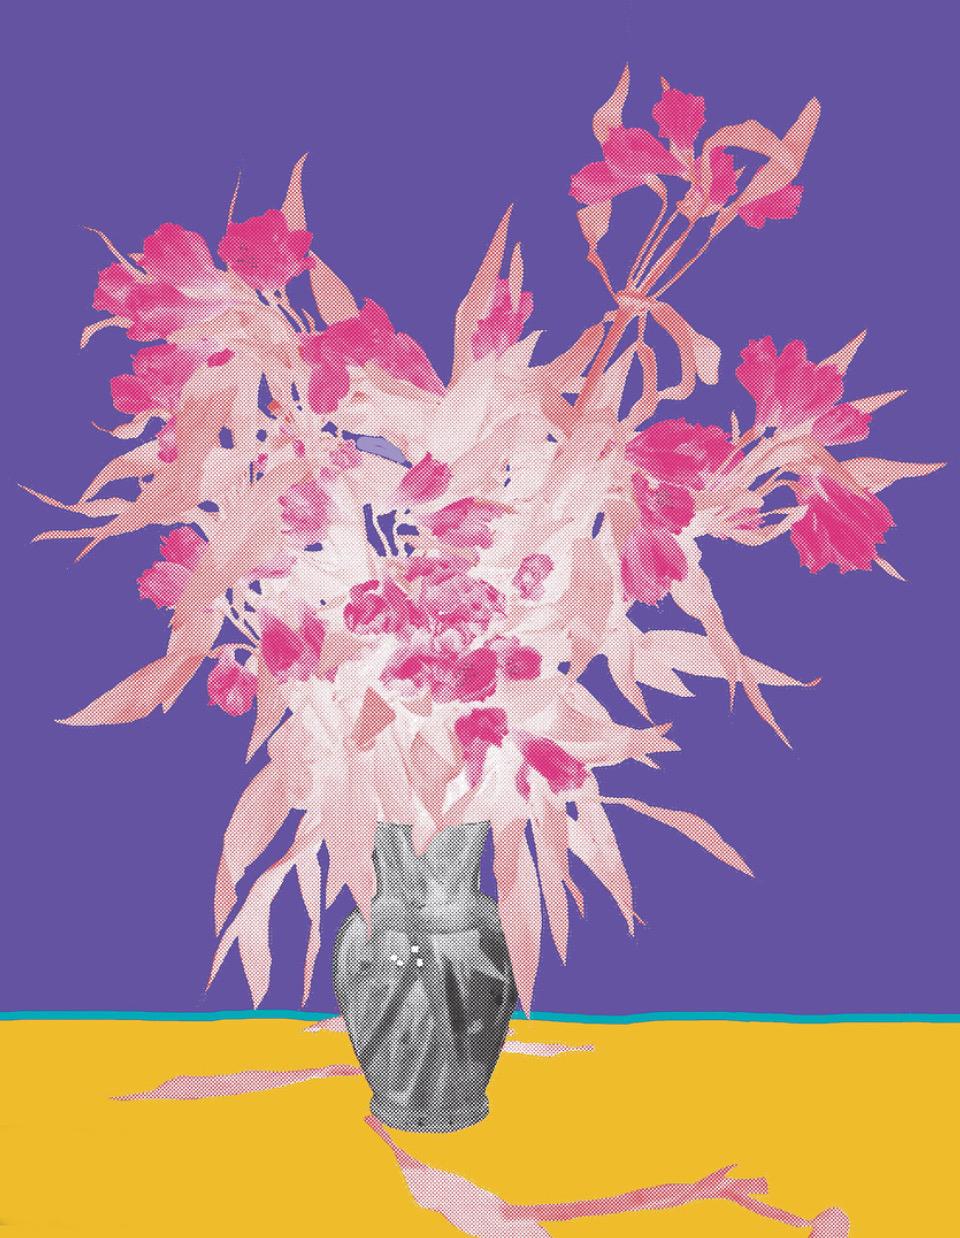 "Flower Vase Purple inkjet printed on hot press bright paper 320g/sm, 19"" X 13"", 2017"